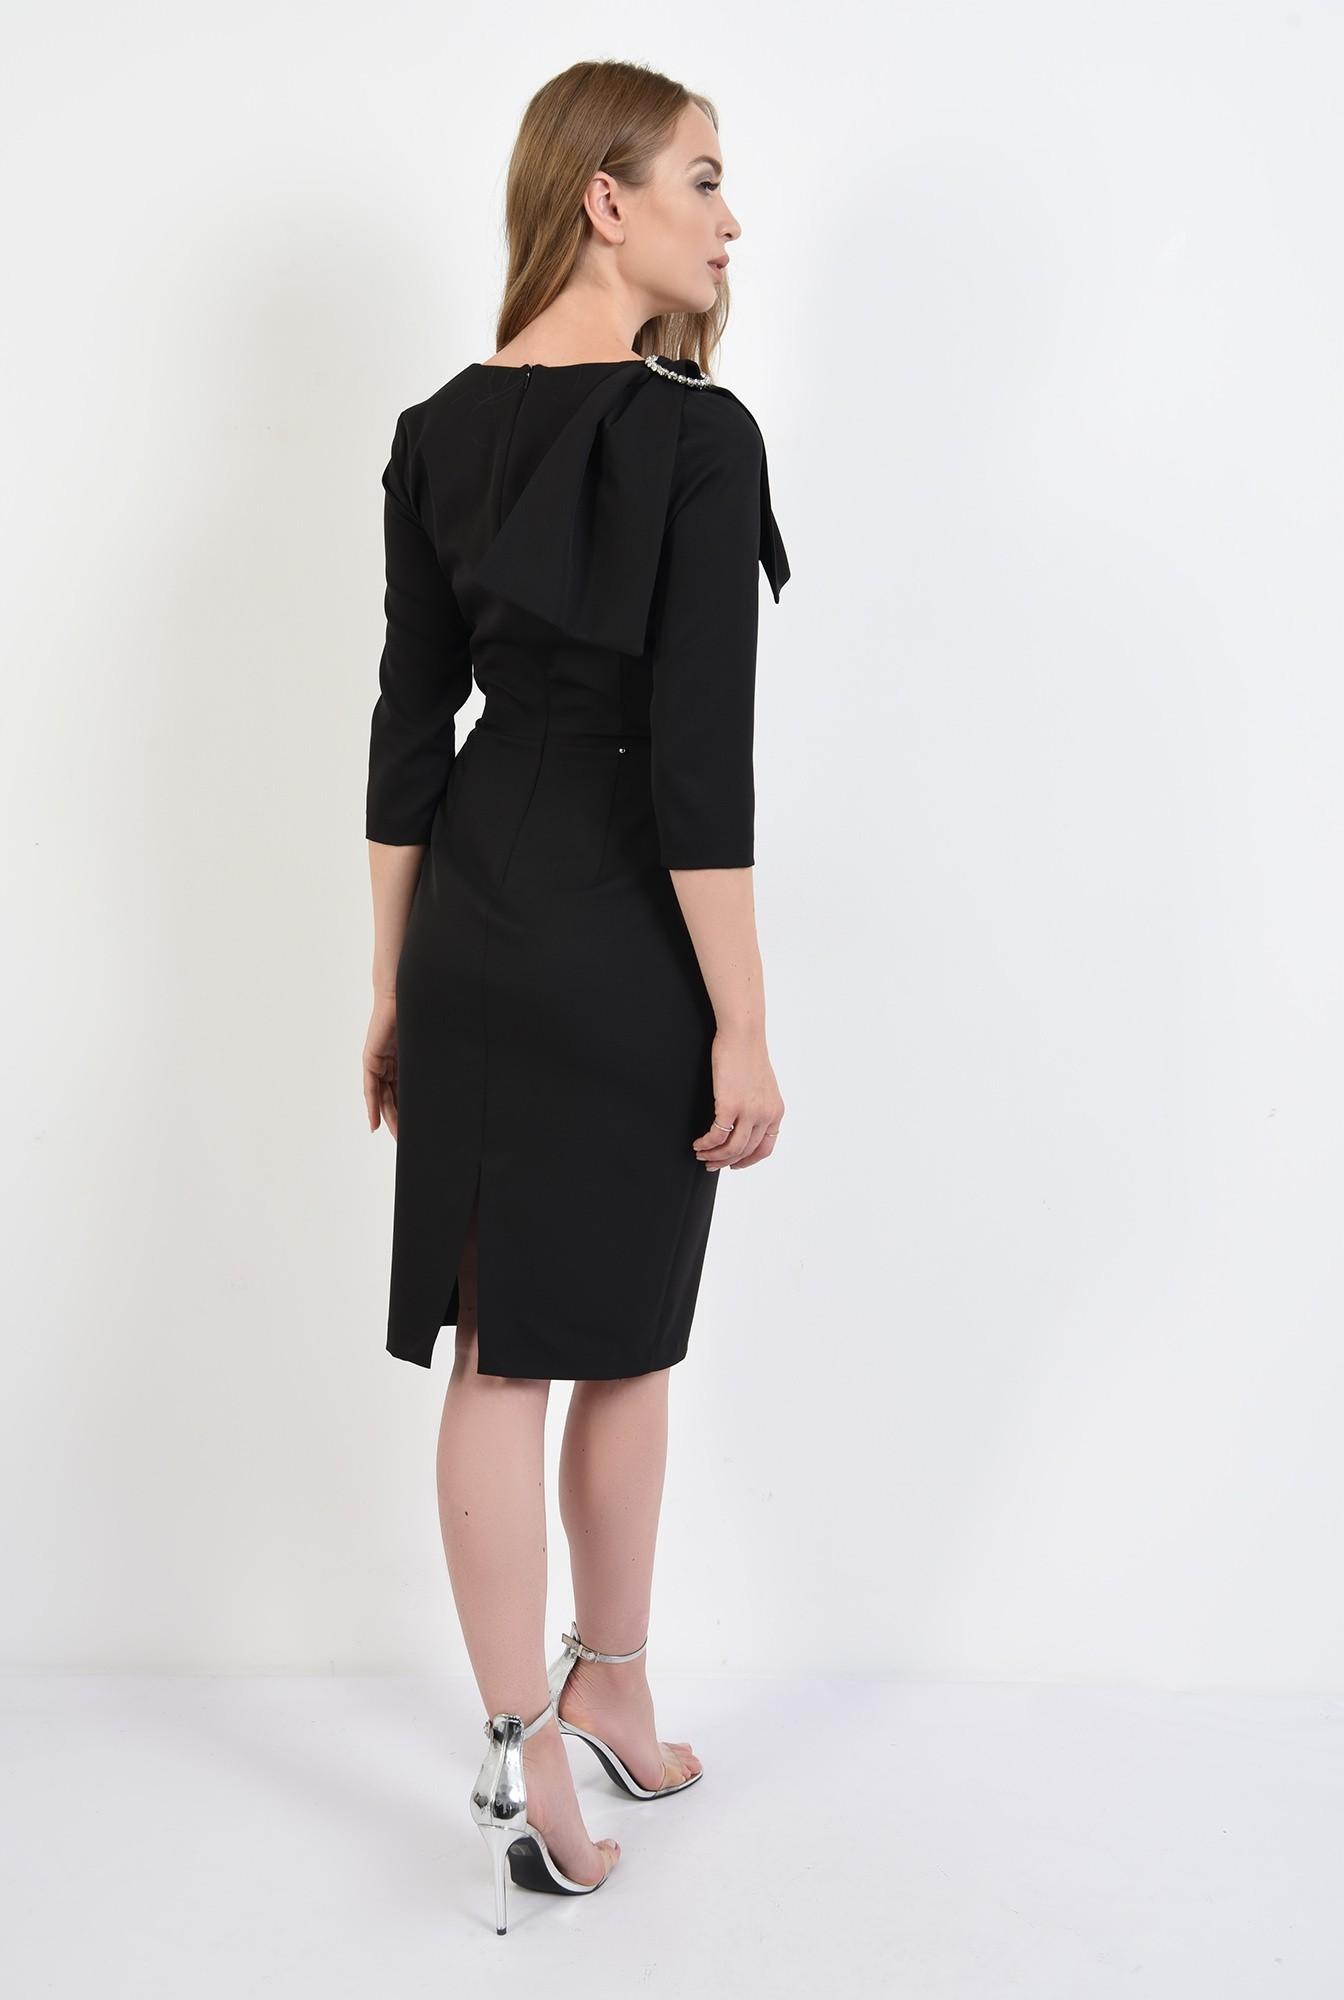 1 - 360 - rochie poema, negra, eleganta, cu funda